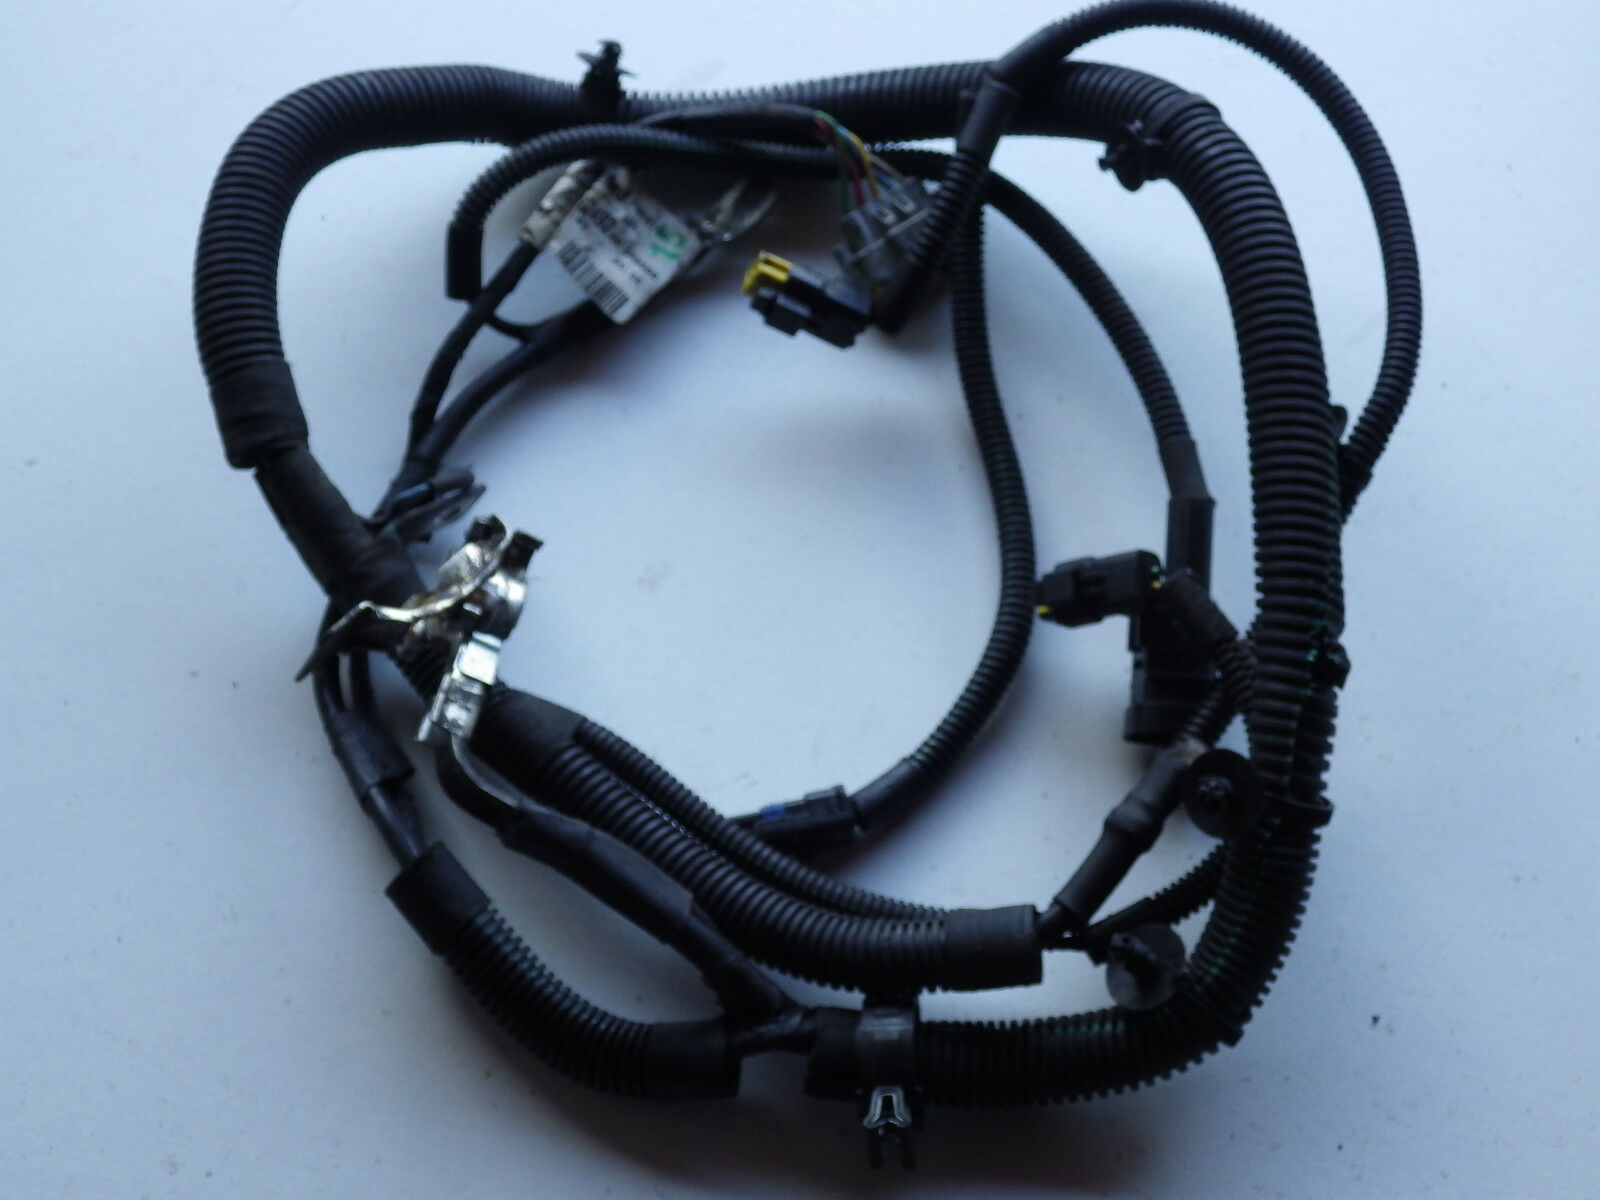 Peugeot 407 Battery Main Wiring Loom Under Bonnet 9658249280 Ebay 207